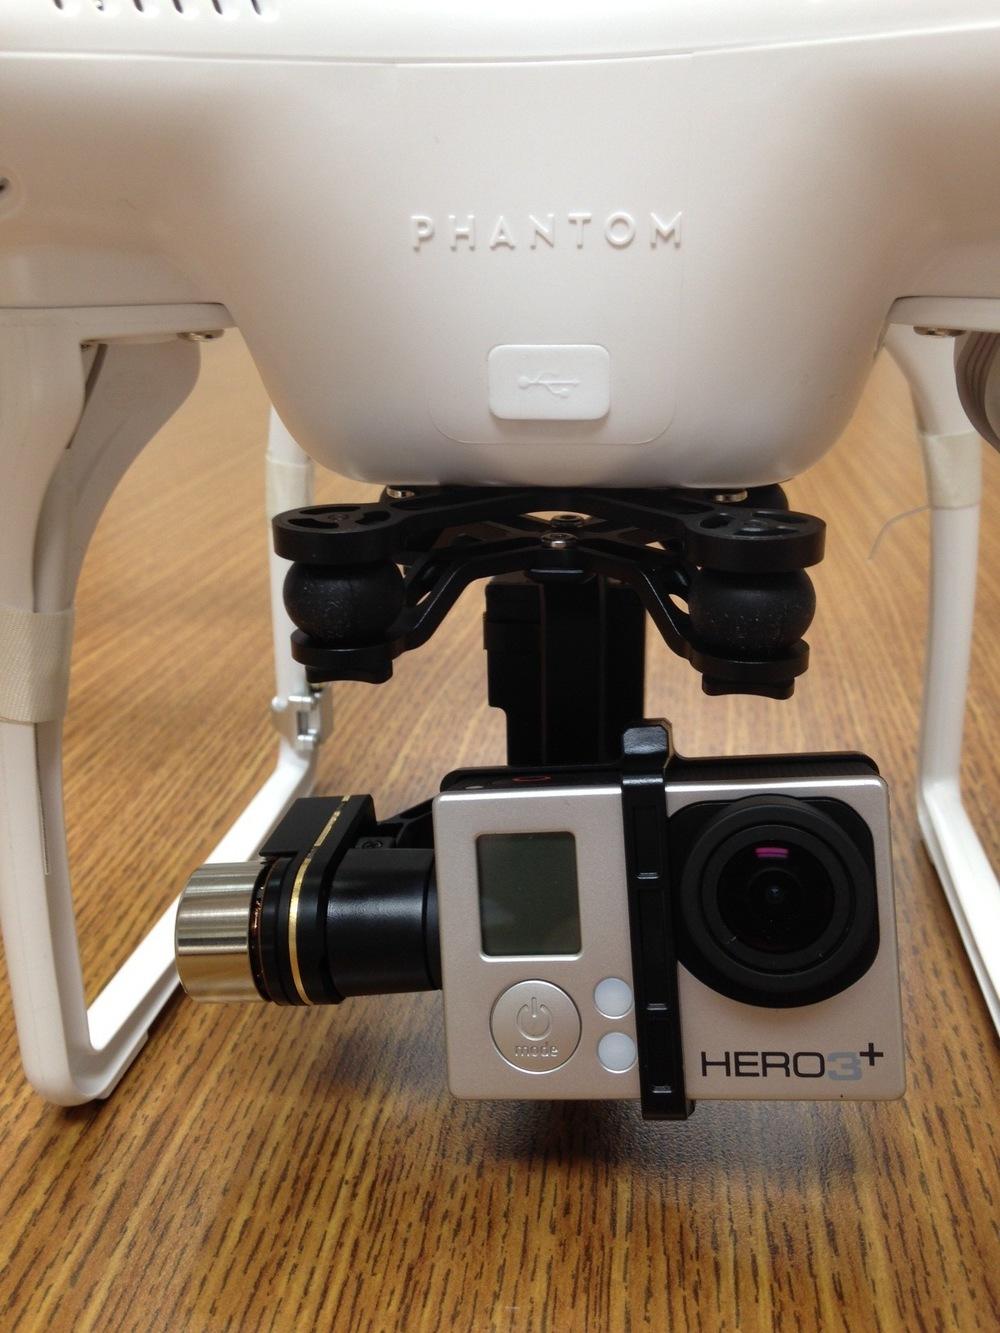 PhantomWithCameraFromFront2.jpg